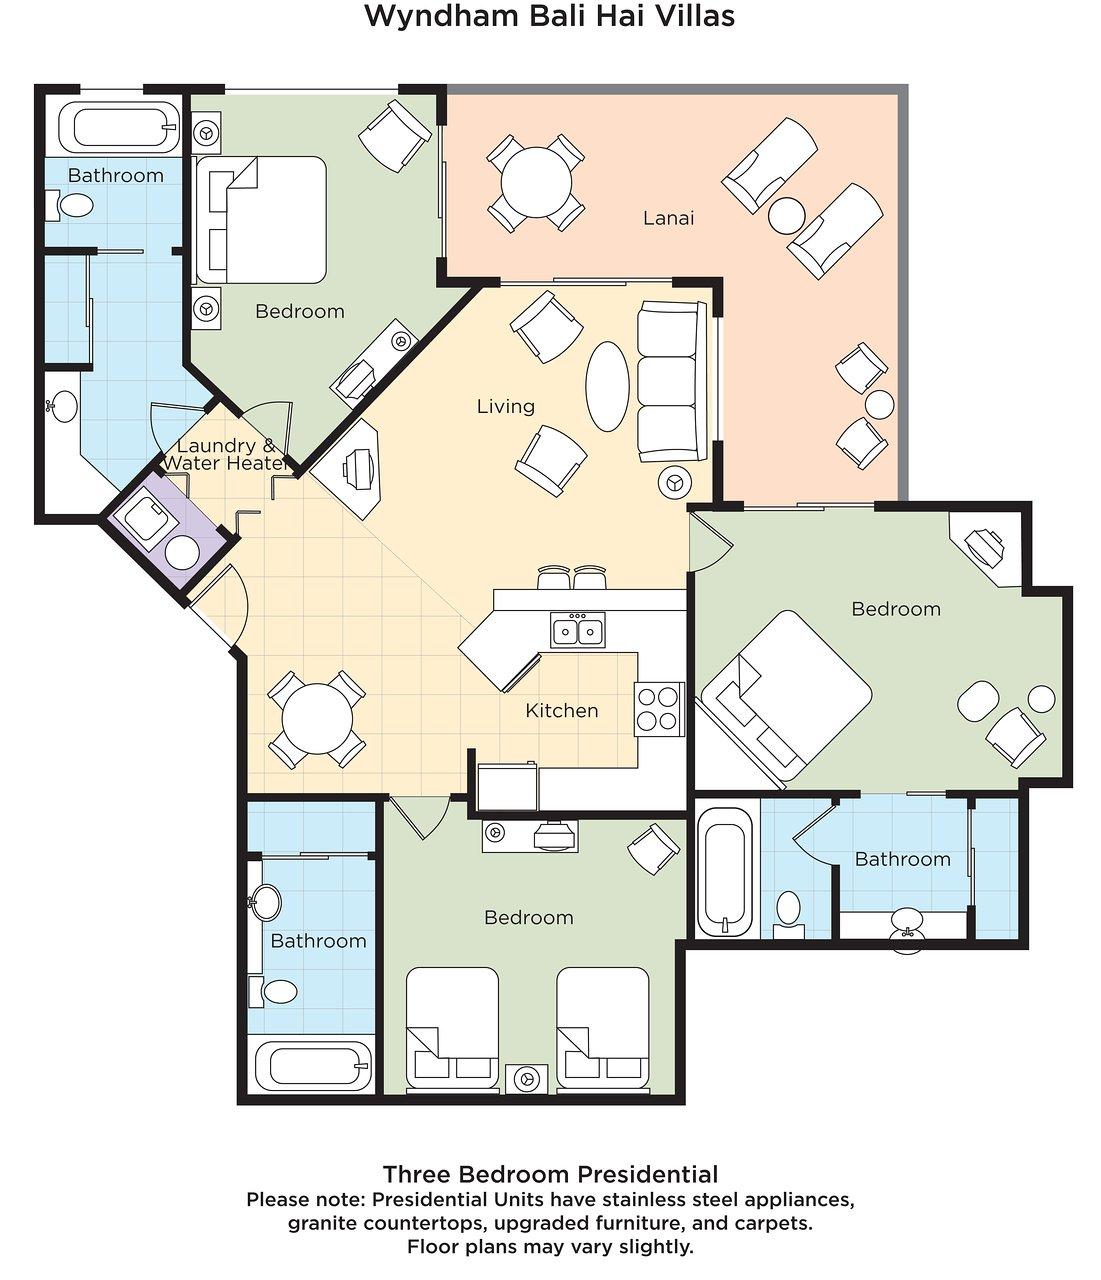 Club Wyndham Bali Hai Villas Villa Reviews Price Comparison Princeville Hi Tripadvisor